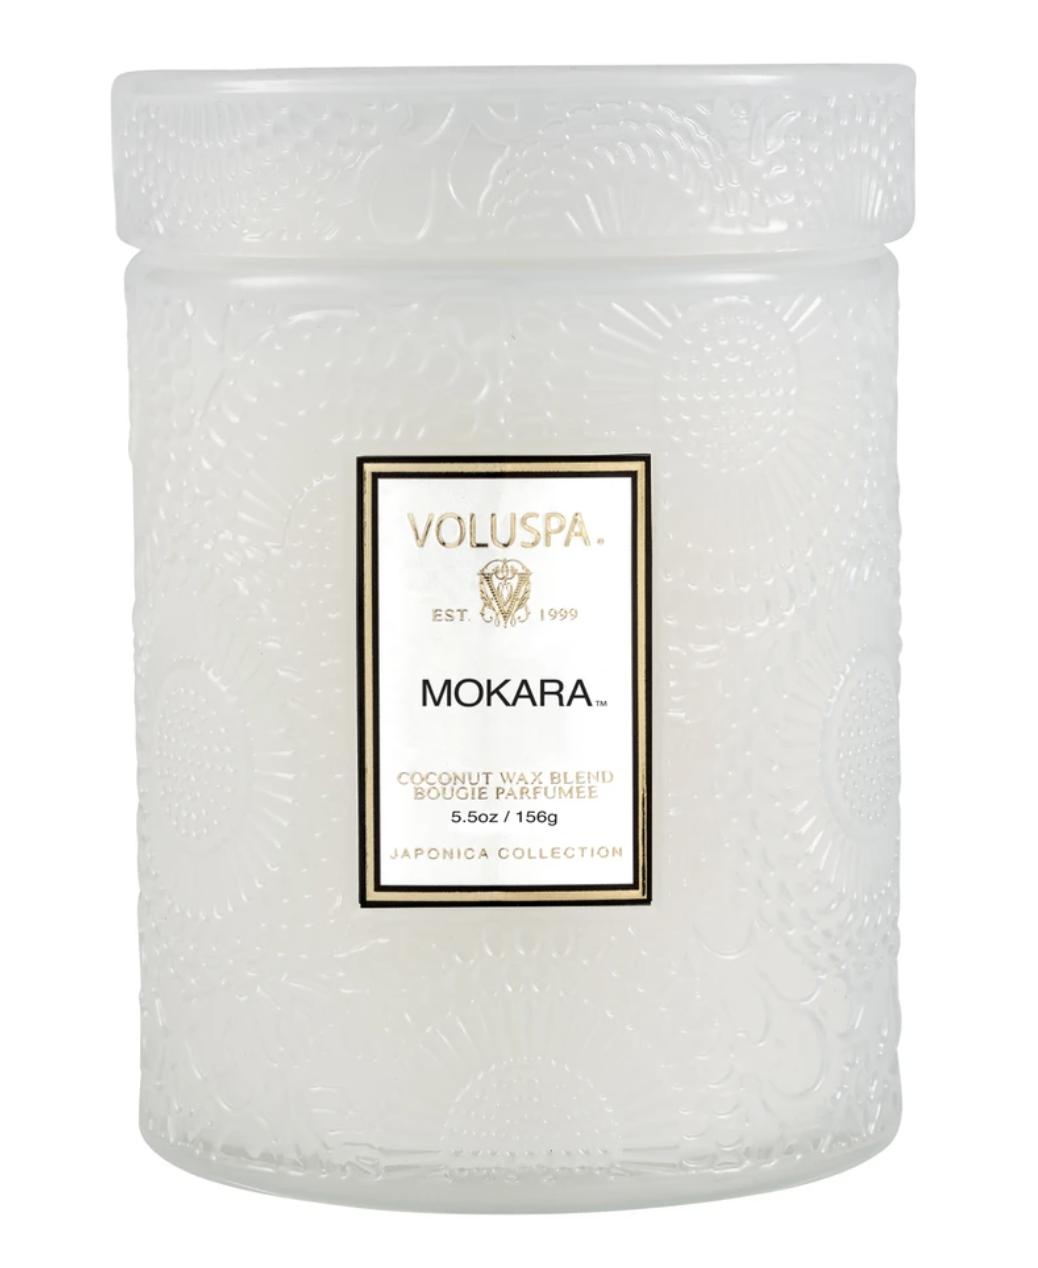 Voluspa Mokara, Embossed Glass Jar with Lid